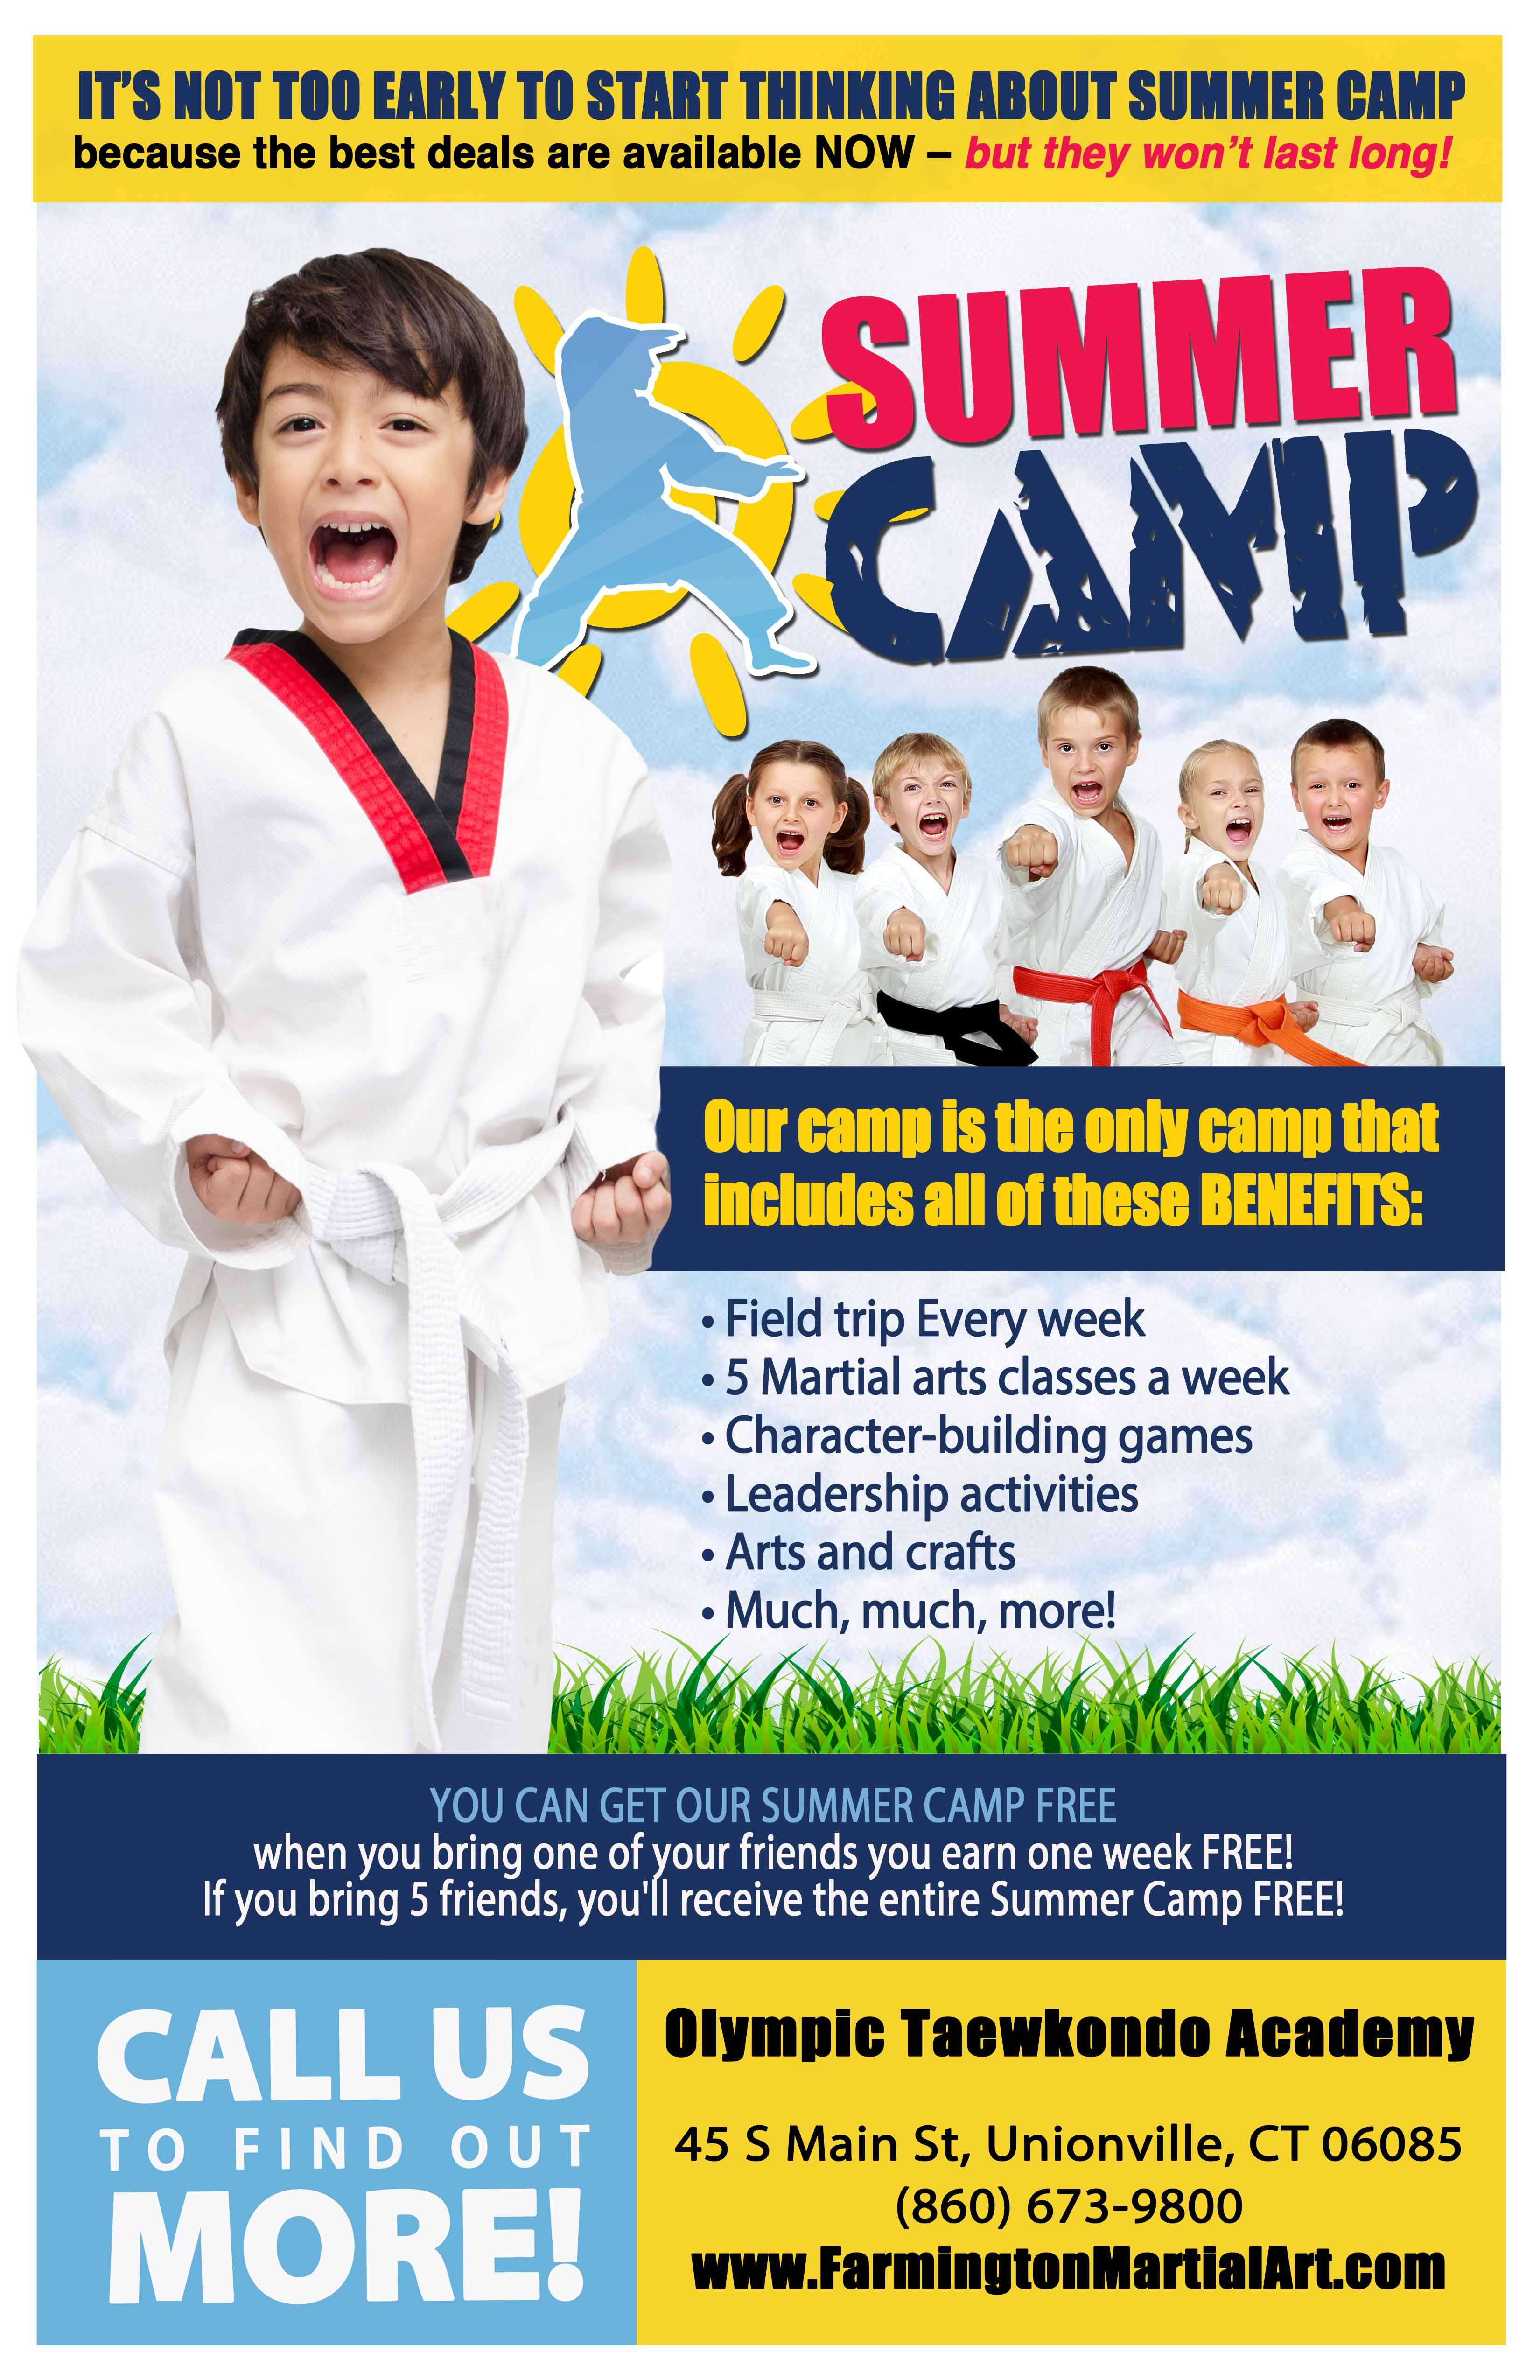 OTA summer camp